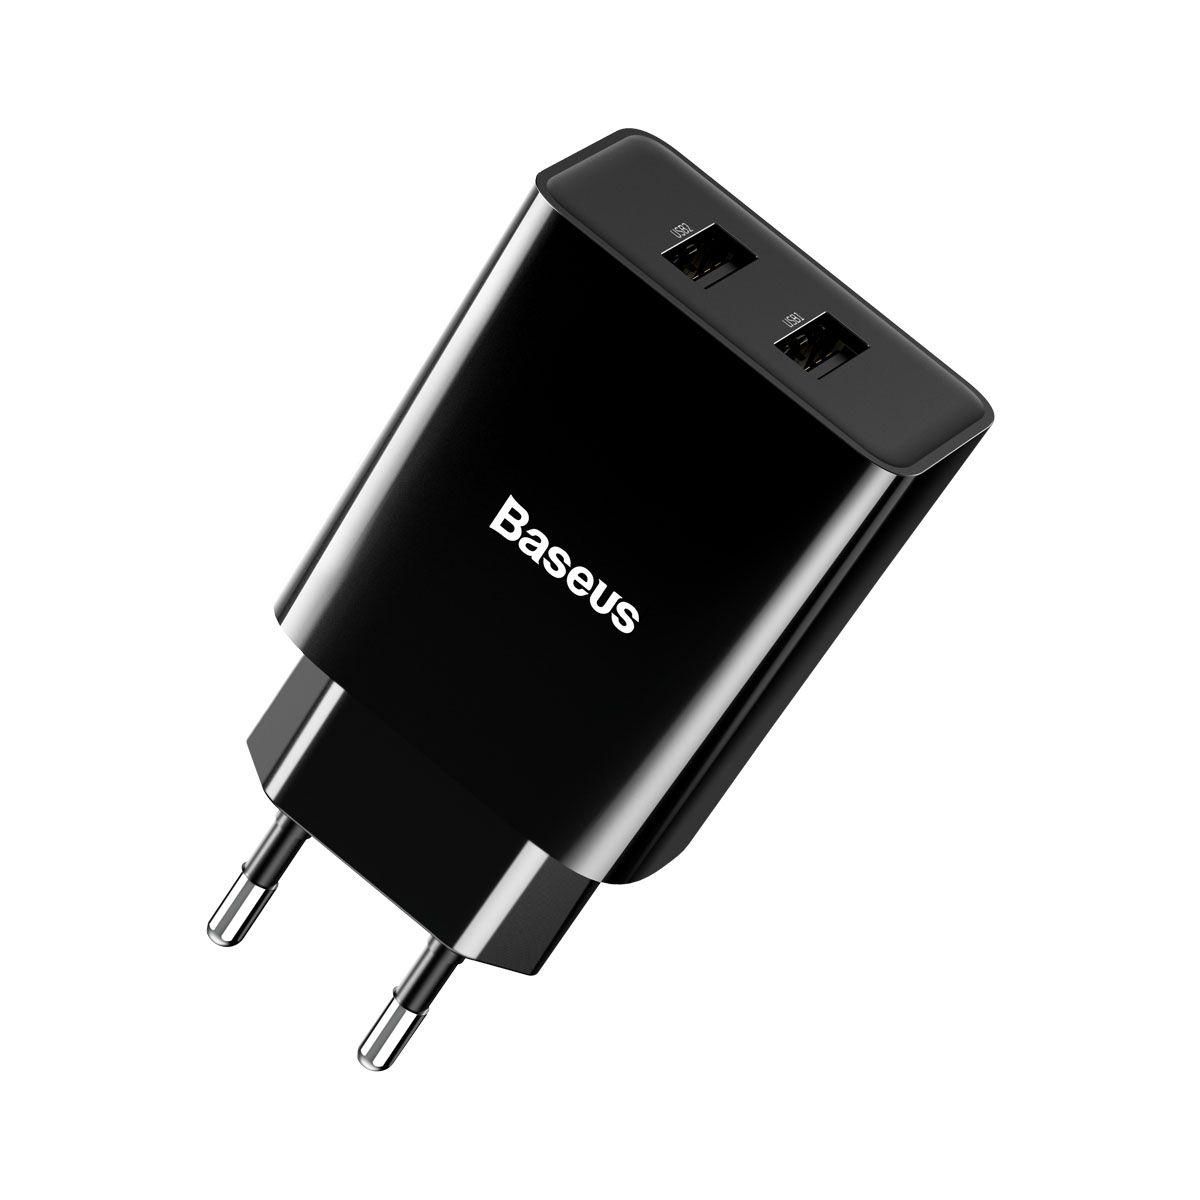 Carregador de Parede Baseus Speed Mini Duplo USB 10.5W